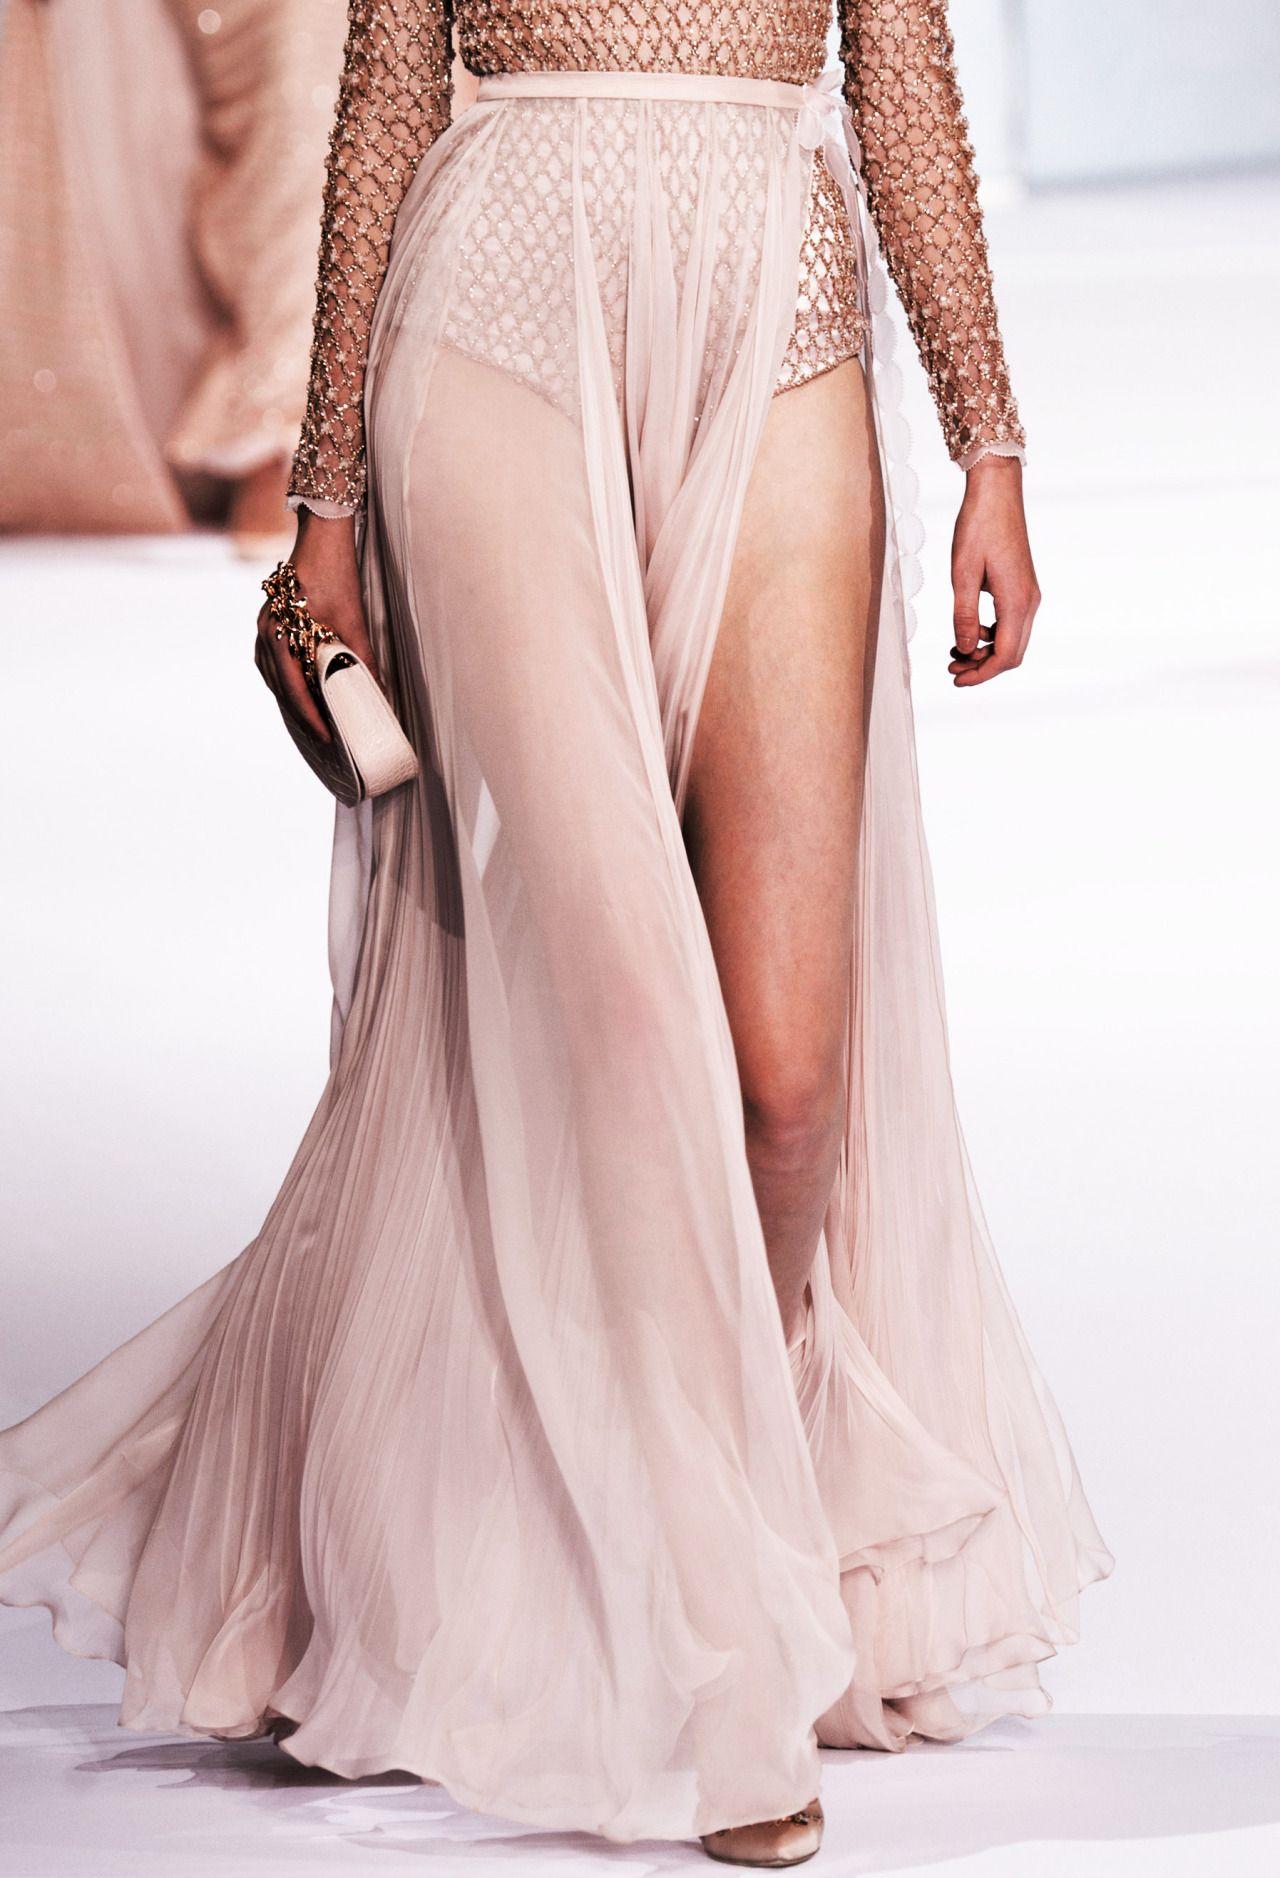 Pin de Johana Gutiérrez en Fashion | Pinterest | Vestidos fiestas ...